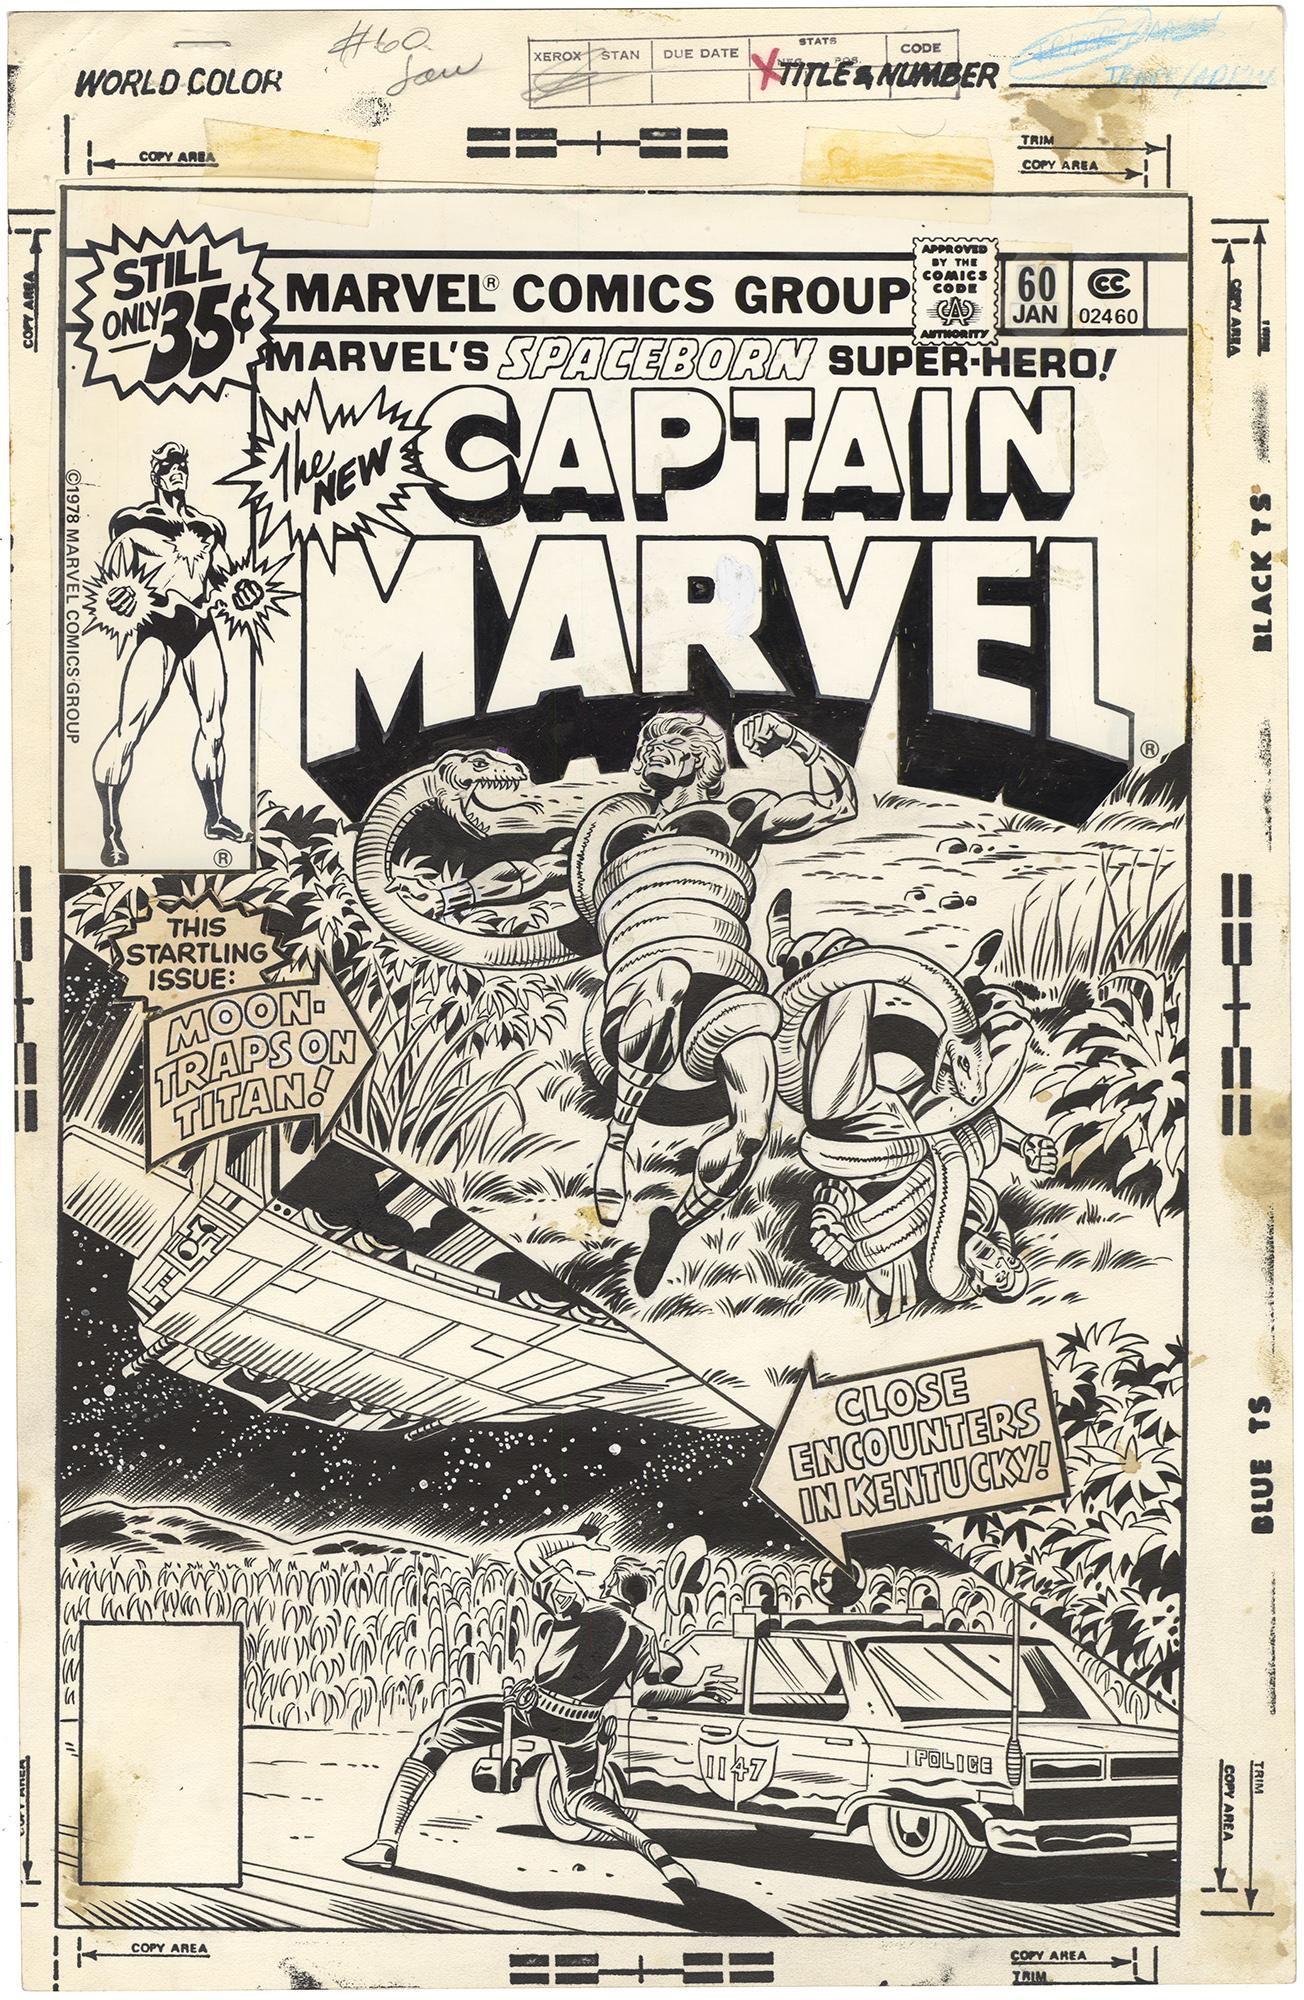 Captain Marvel #60 Cover